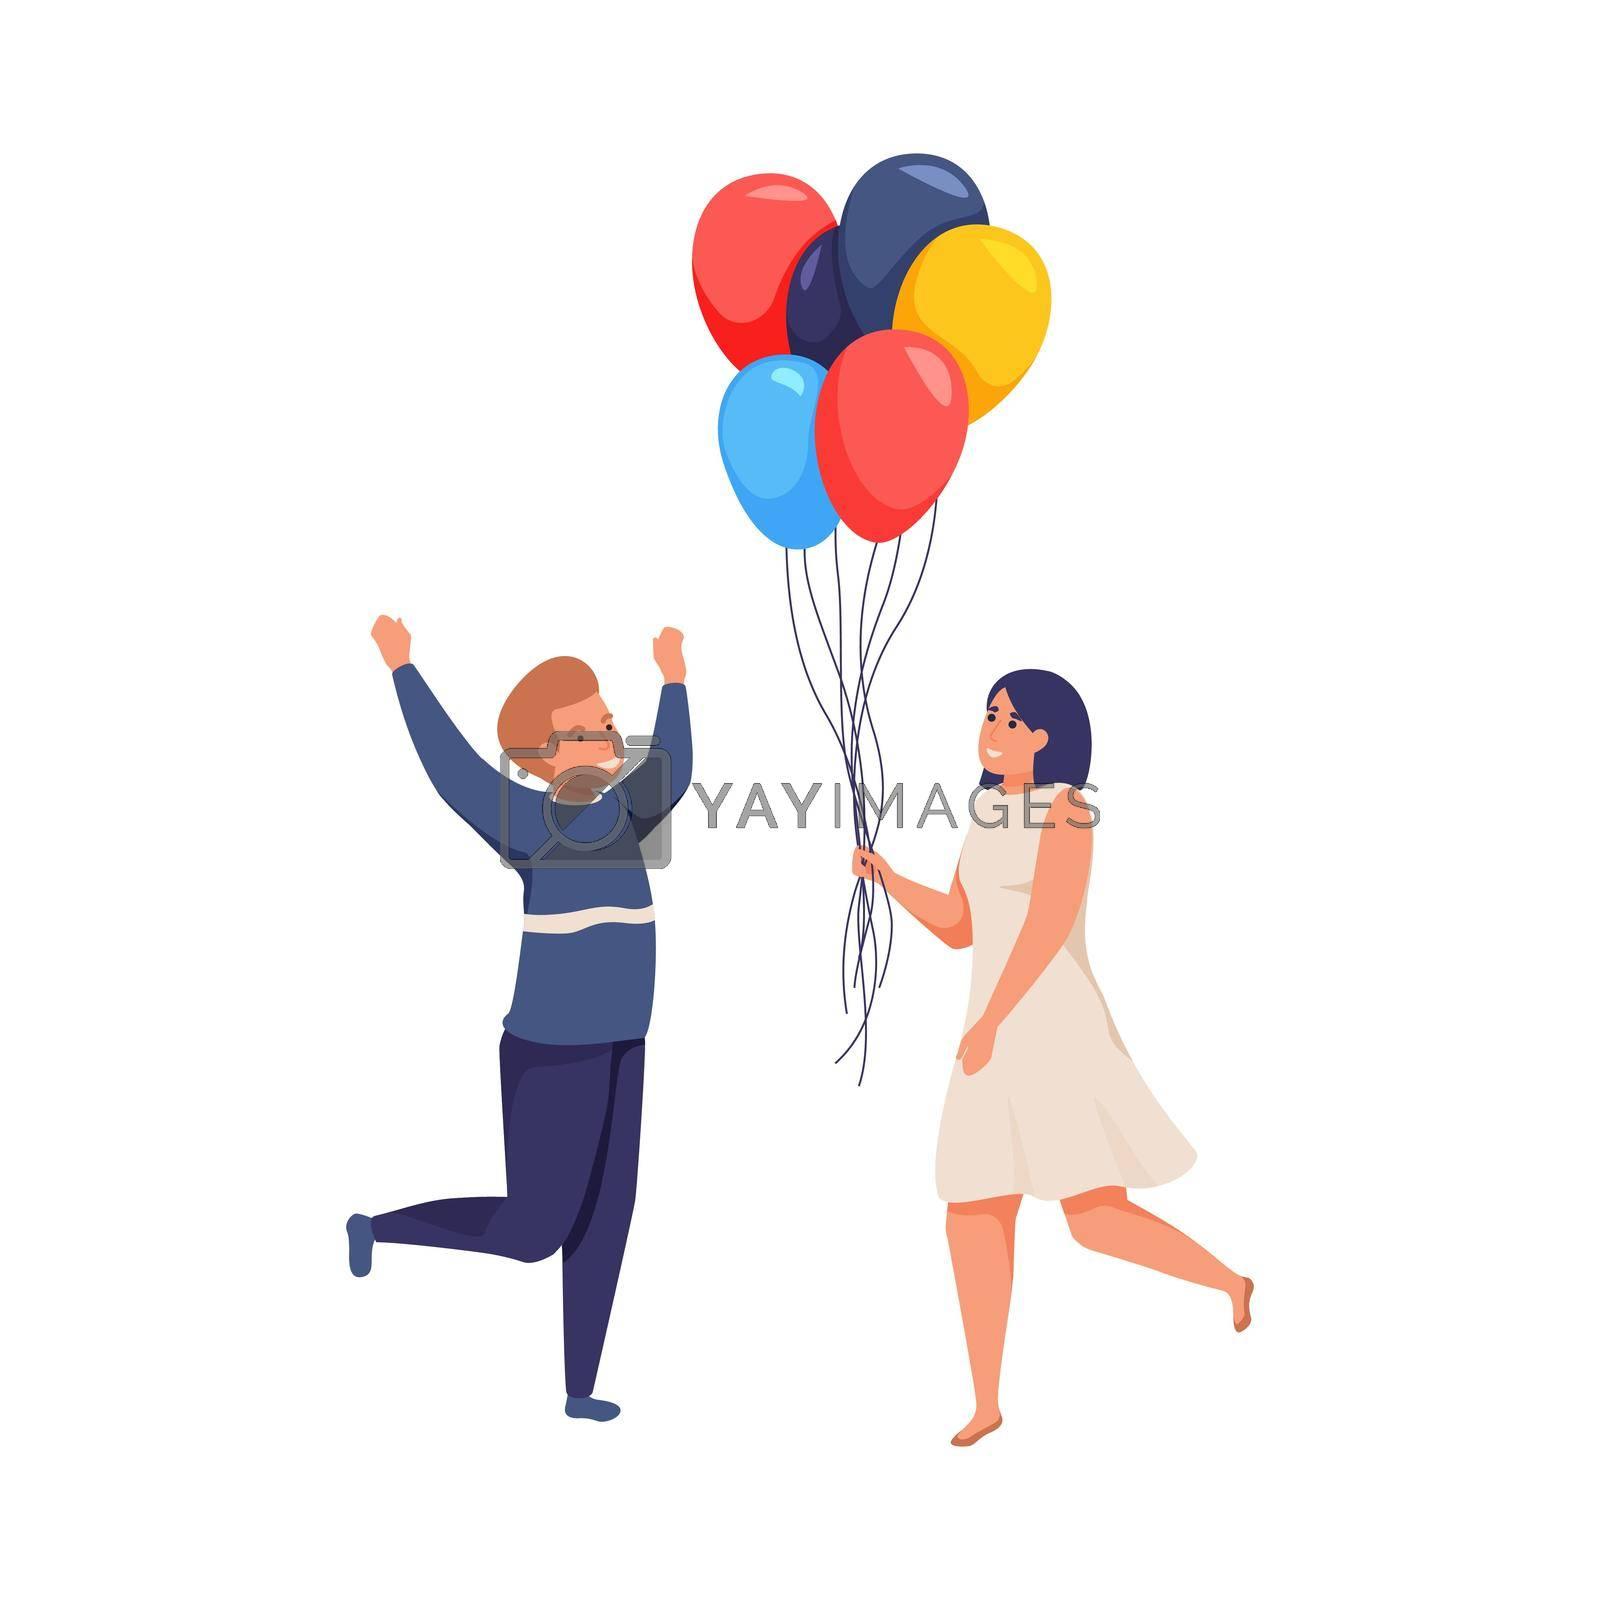 Royalty free image of People With Balloons by mstjahanara